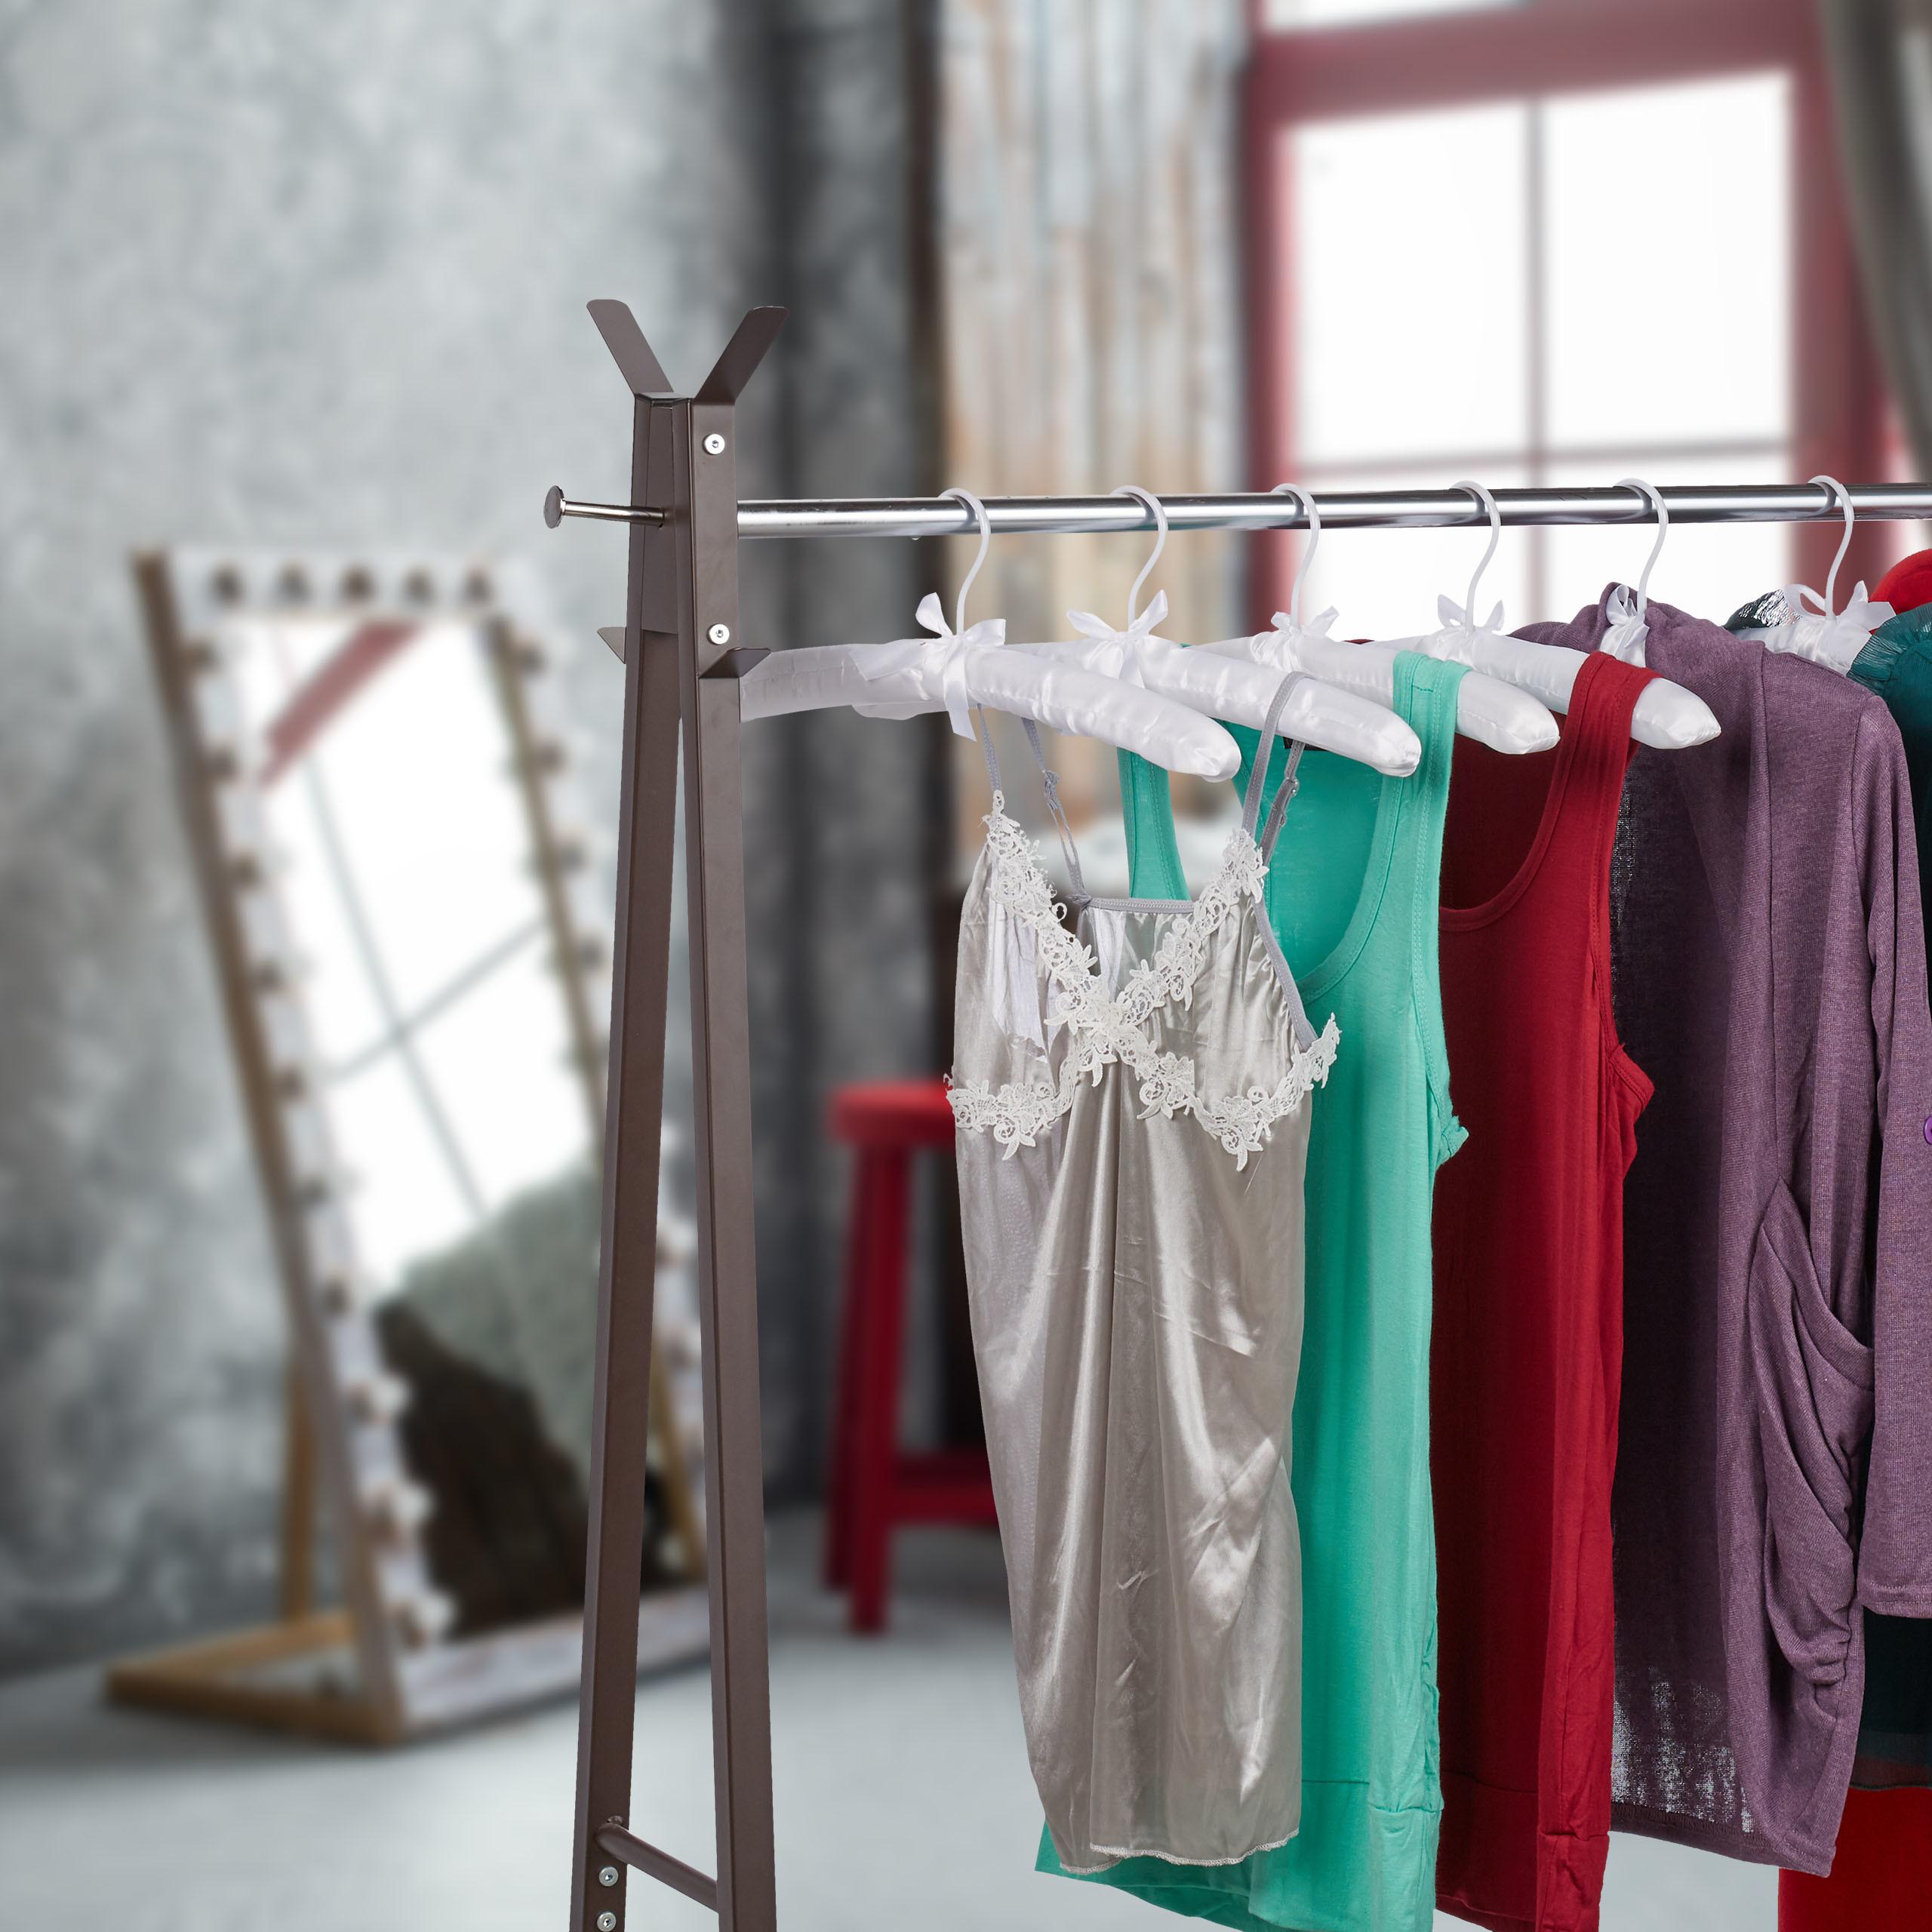 Blusenbügel Kleiderbügel Satin gepolsterte Jackenbügel Clothes Hanger 38 cm